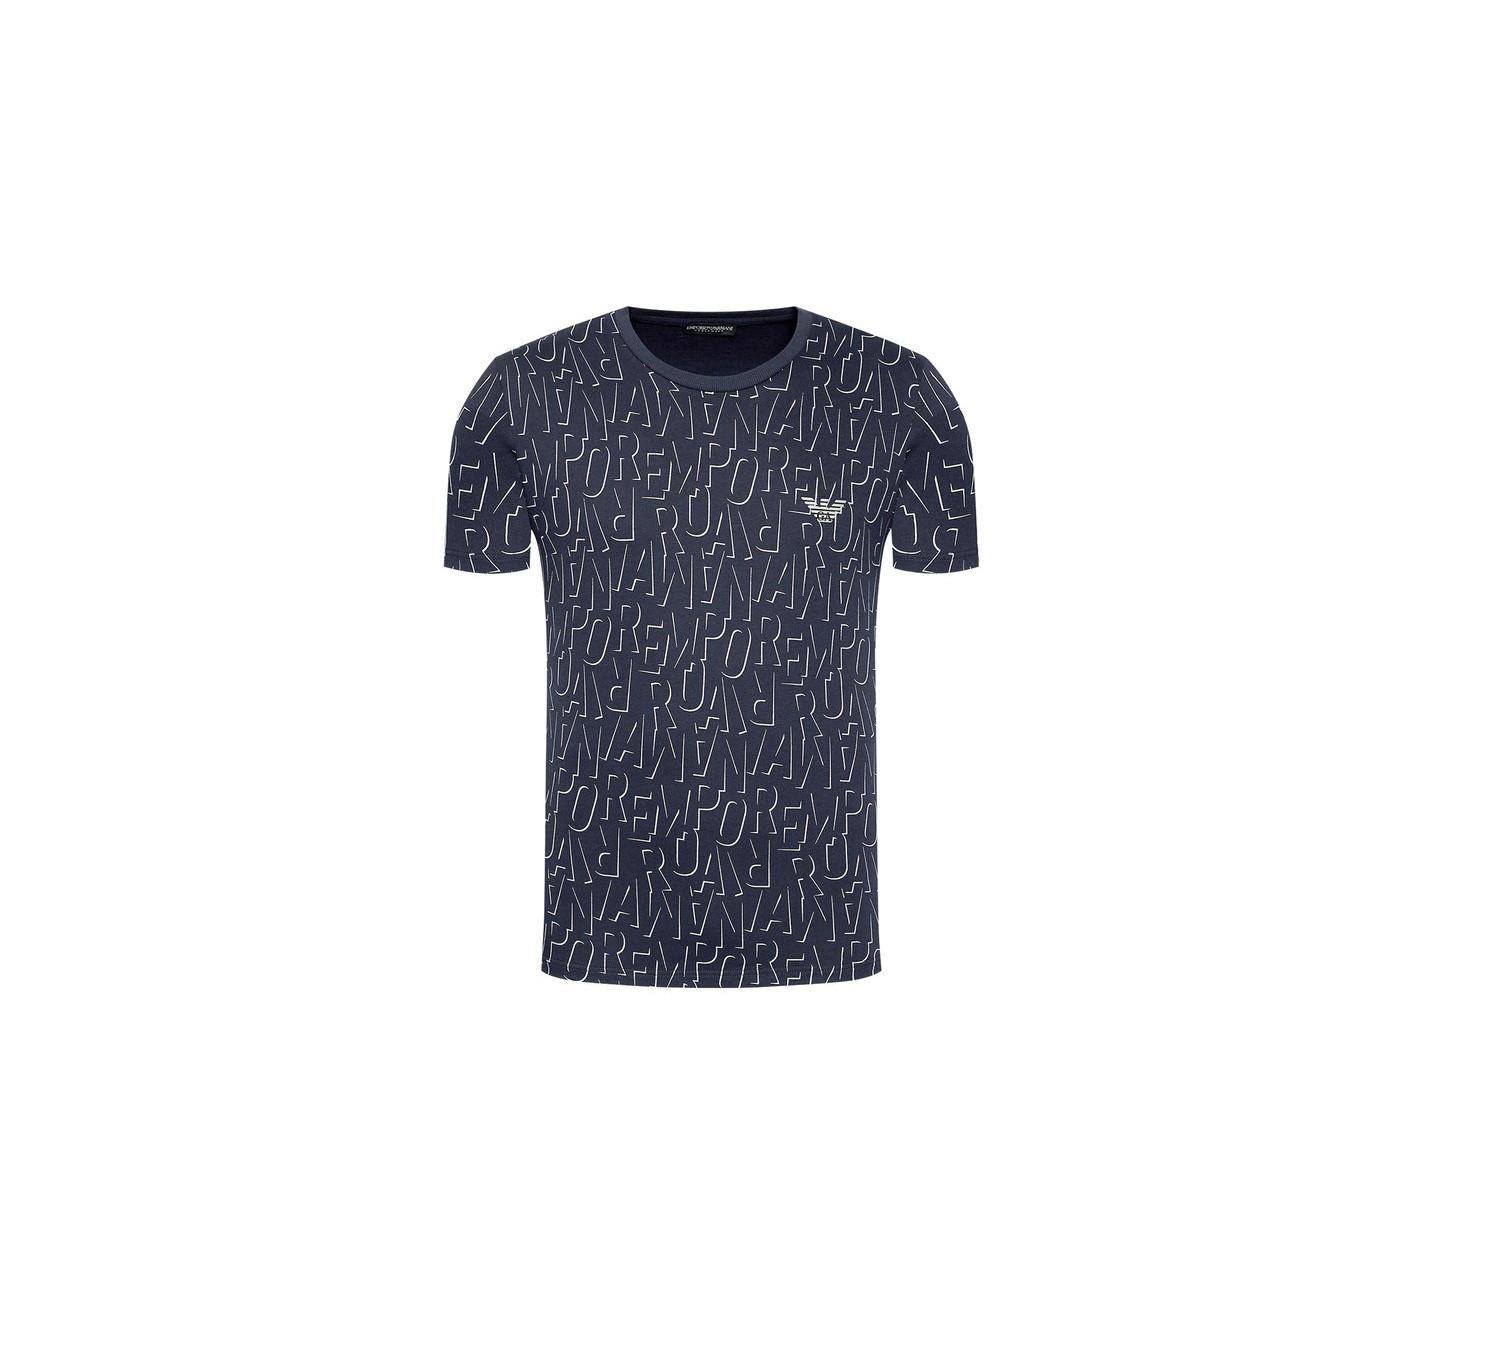 Armani EMPORIO ARMANI pánské tmavě modré tričko